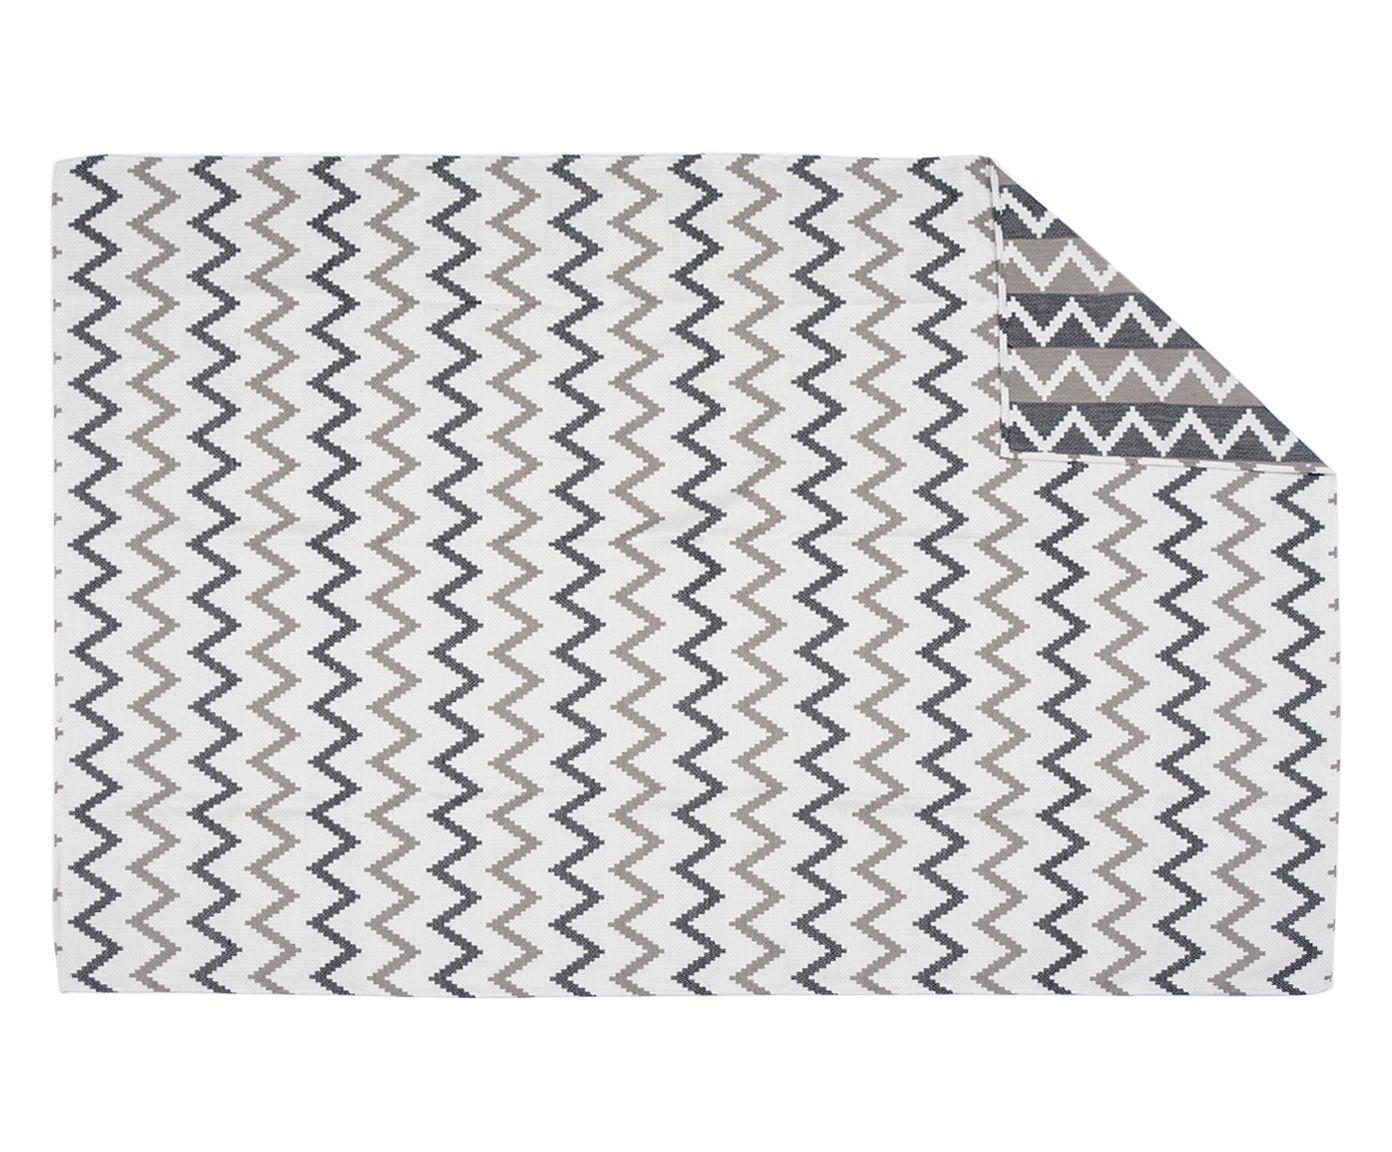 Manta Dupla Face Essence - 140X190cm | Westwing.com.br